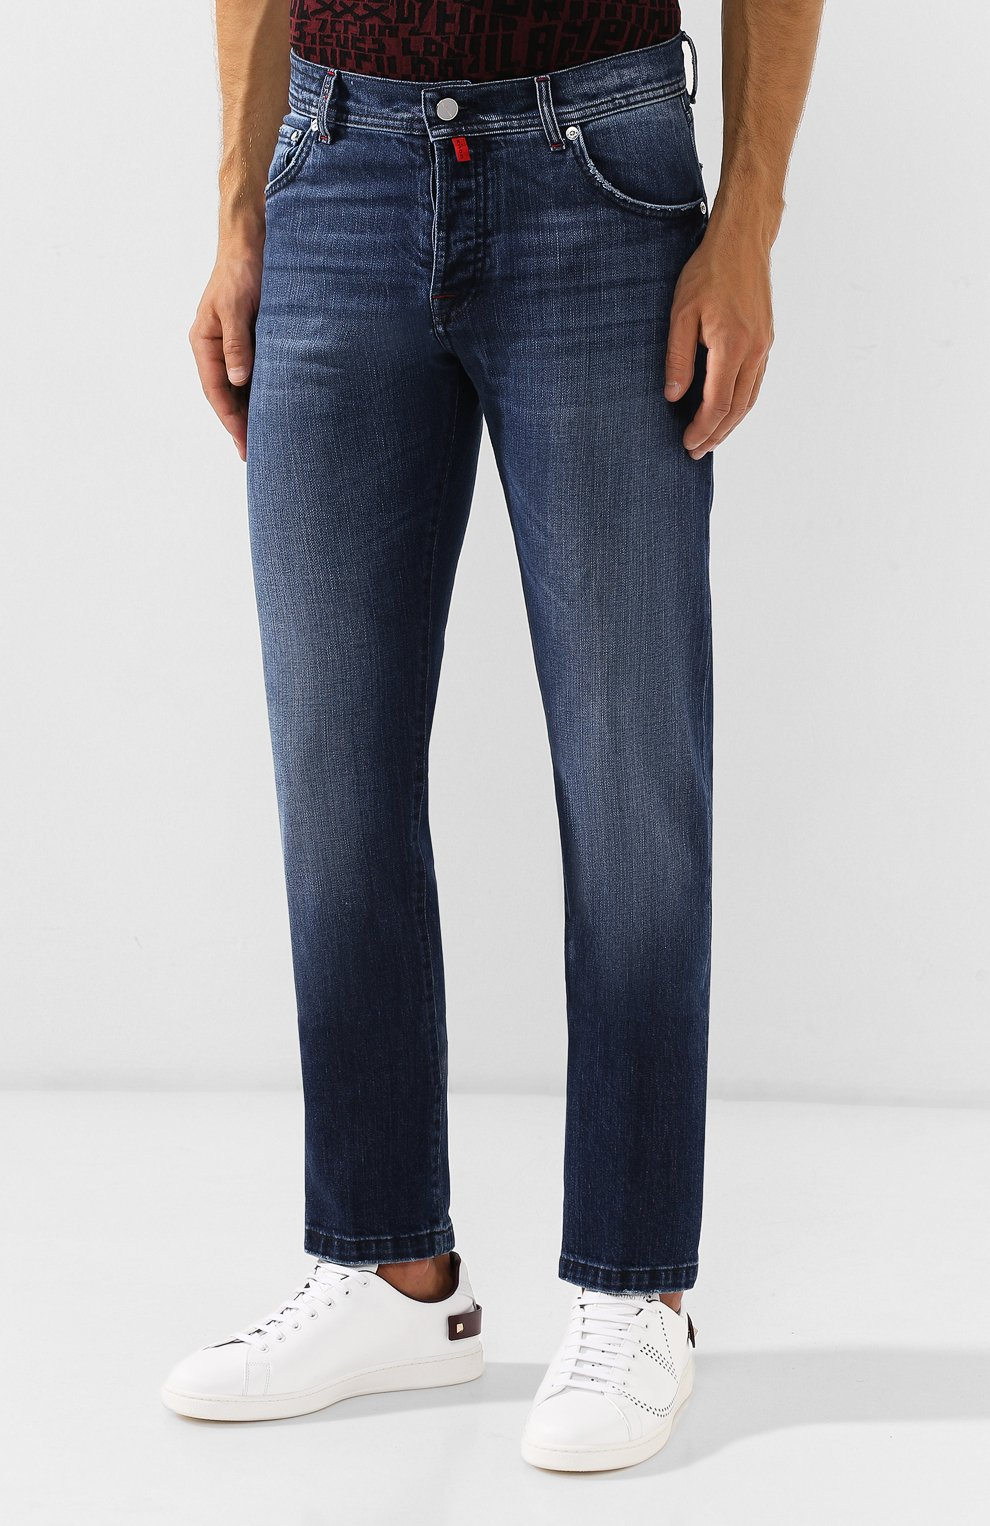 Мужские джинсы KITON синего цвета, арт. UPNJS/J03S51 | Фото 3